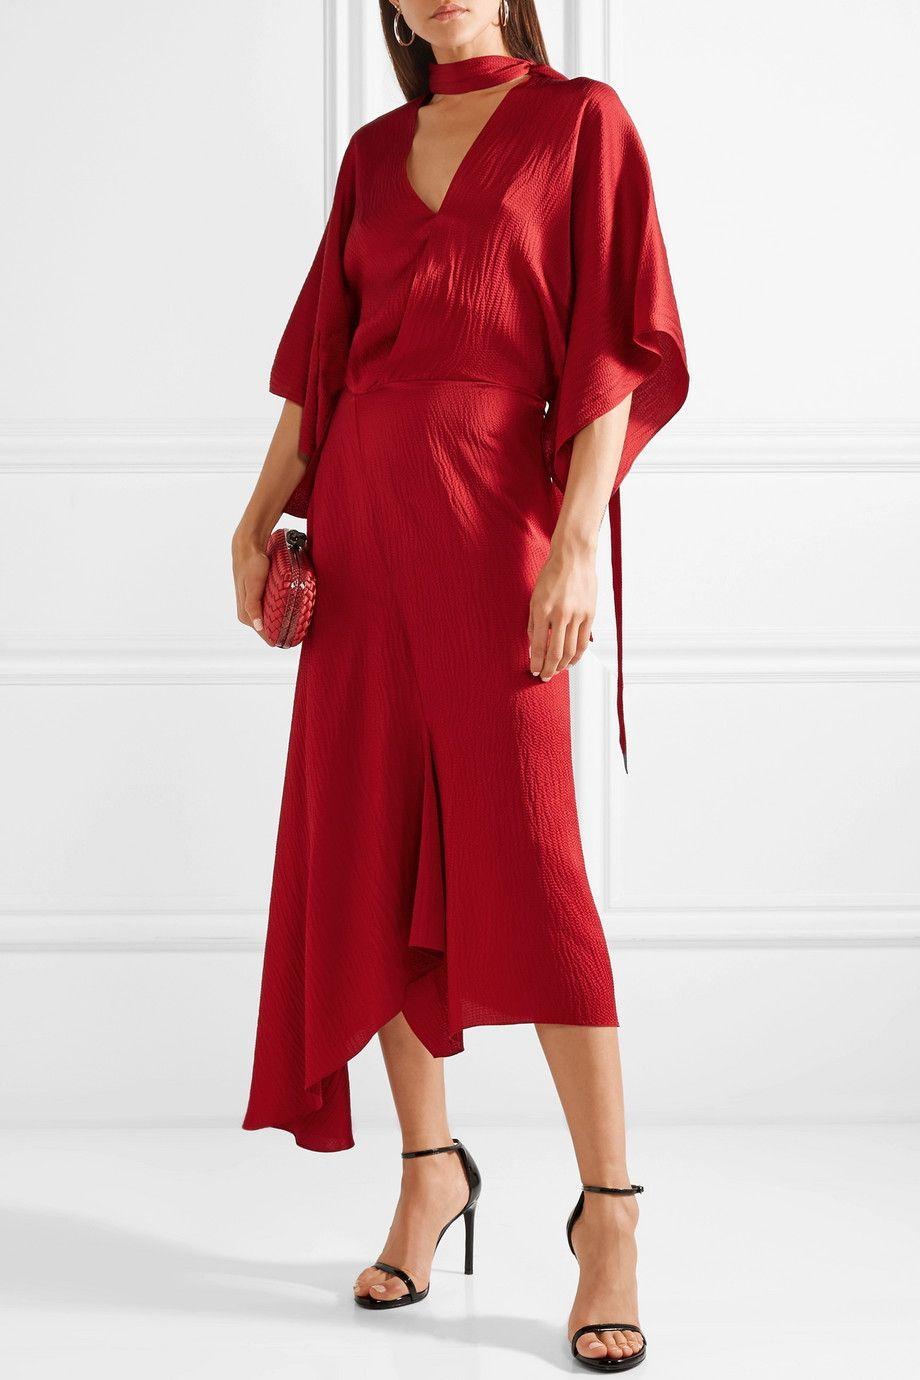 seda Roland A Net de satinado Wrap Efecto Satin Dress Midi MouretMeyers Porter asimétrico com xw4qAaYw